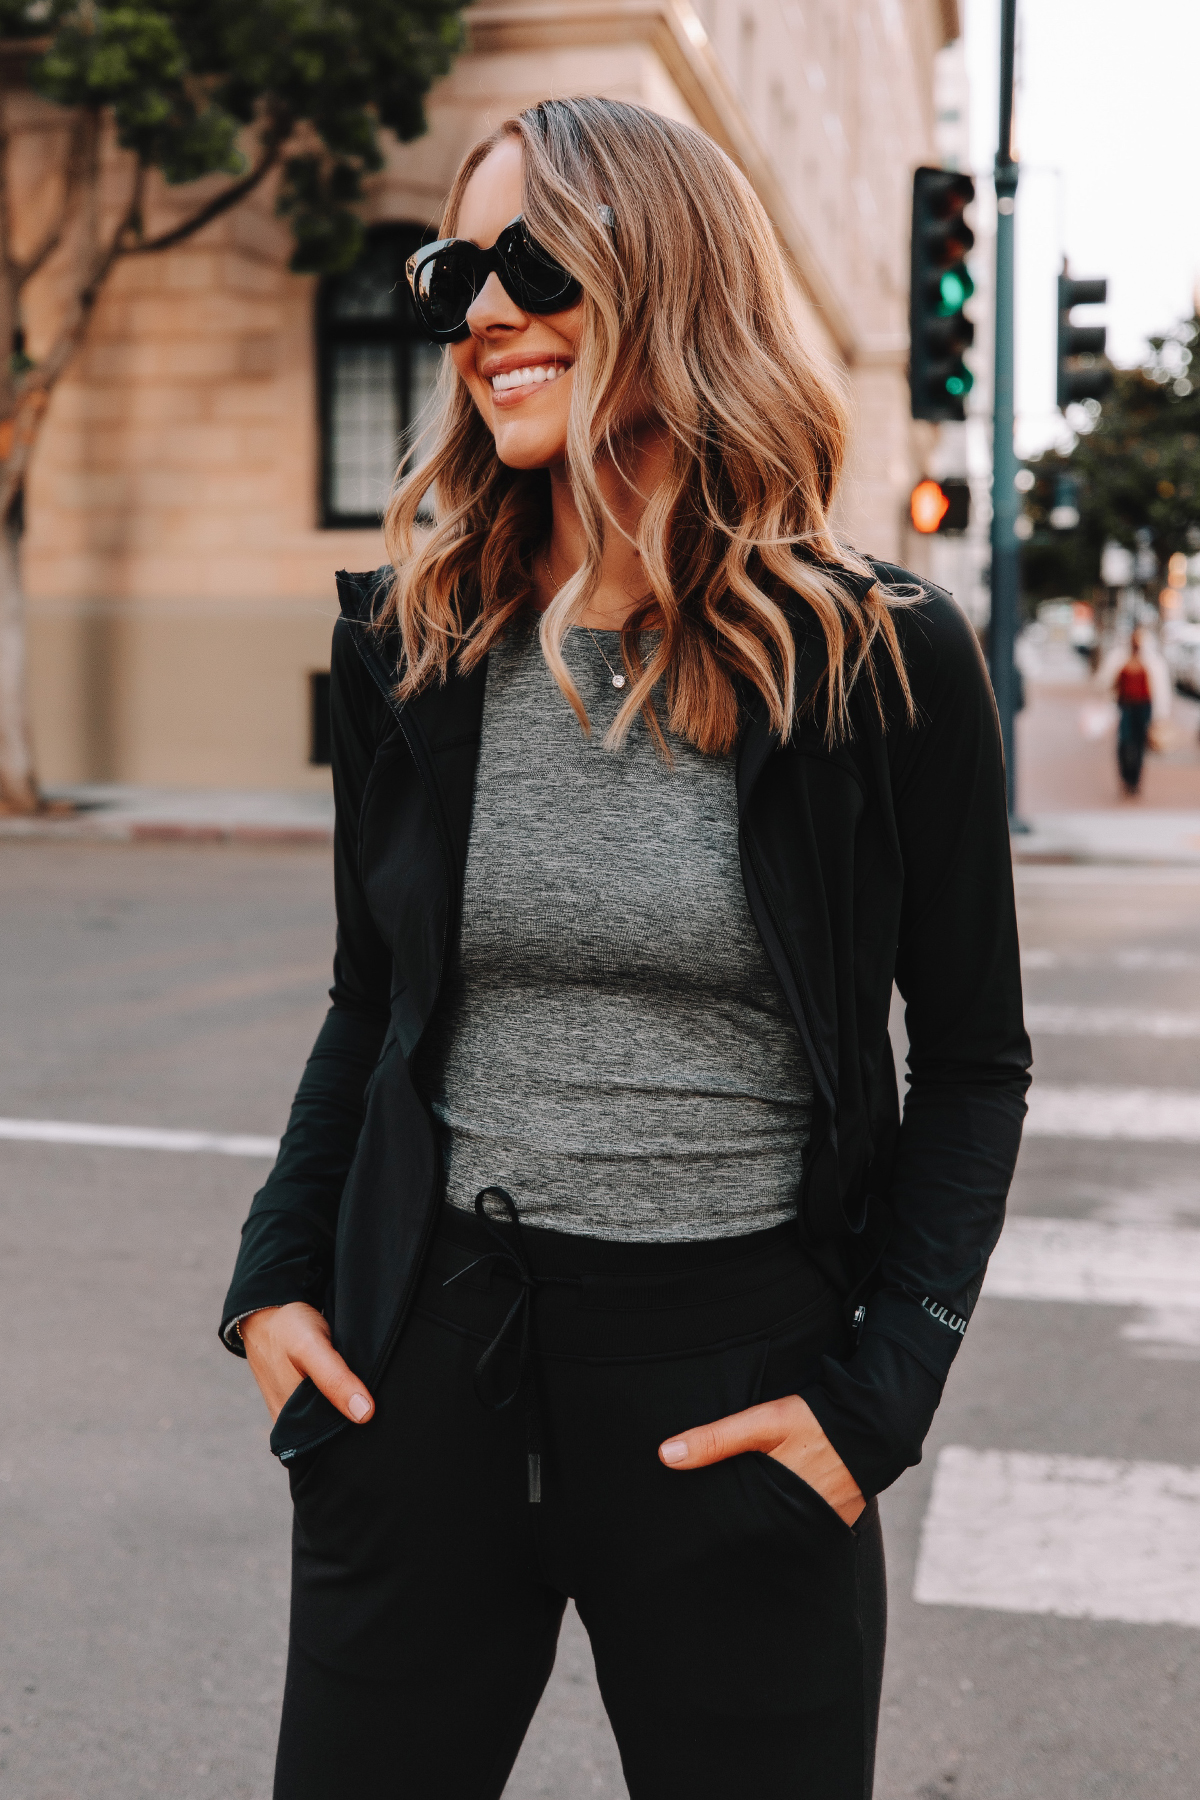 Fashion Jackson Wearing lululemon Black Jacket Grey Workout Top